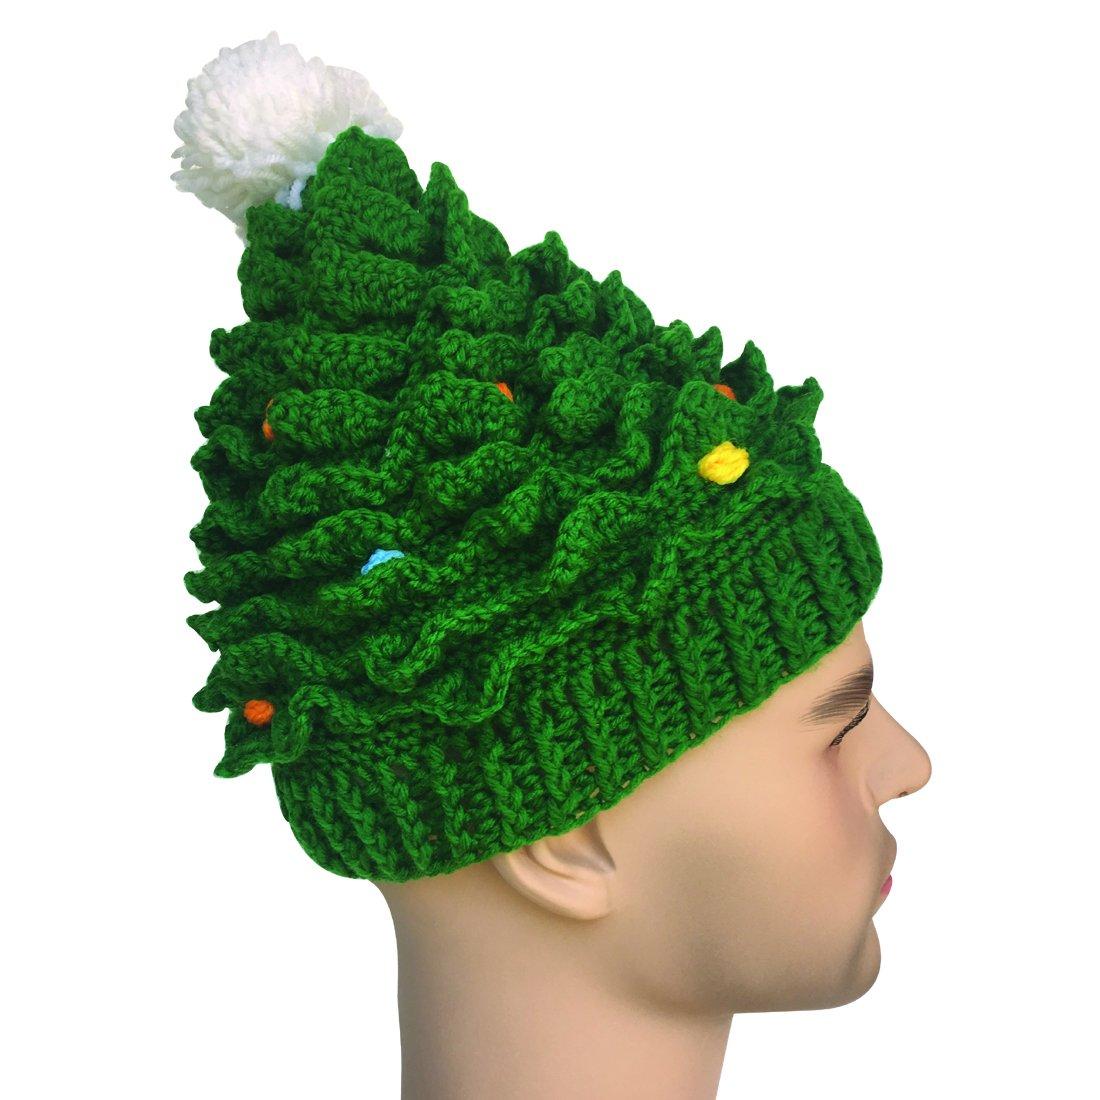 Kafeimali Unisex Christmas Winter Knitted Crochet Beanie Santa Hat